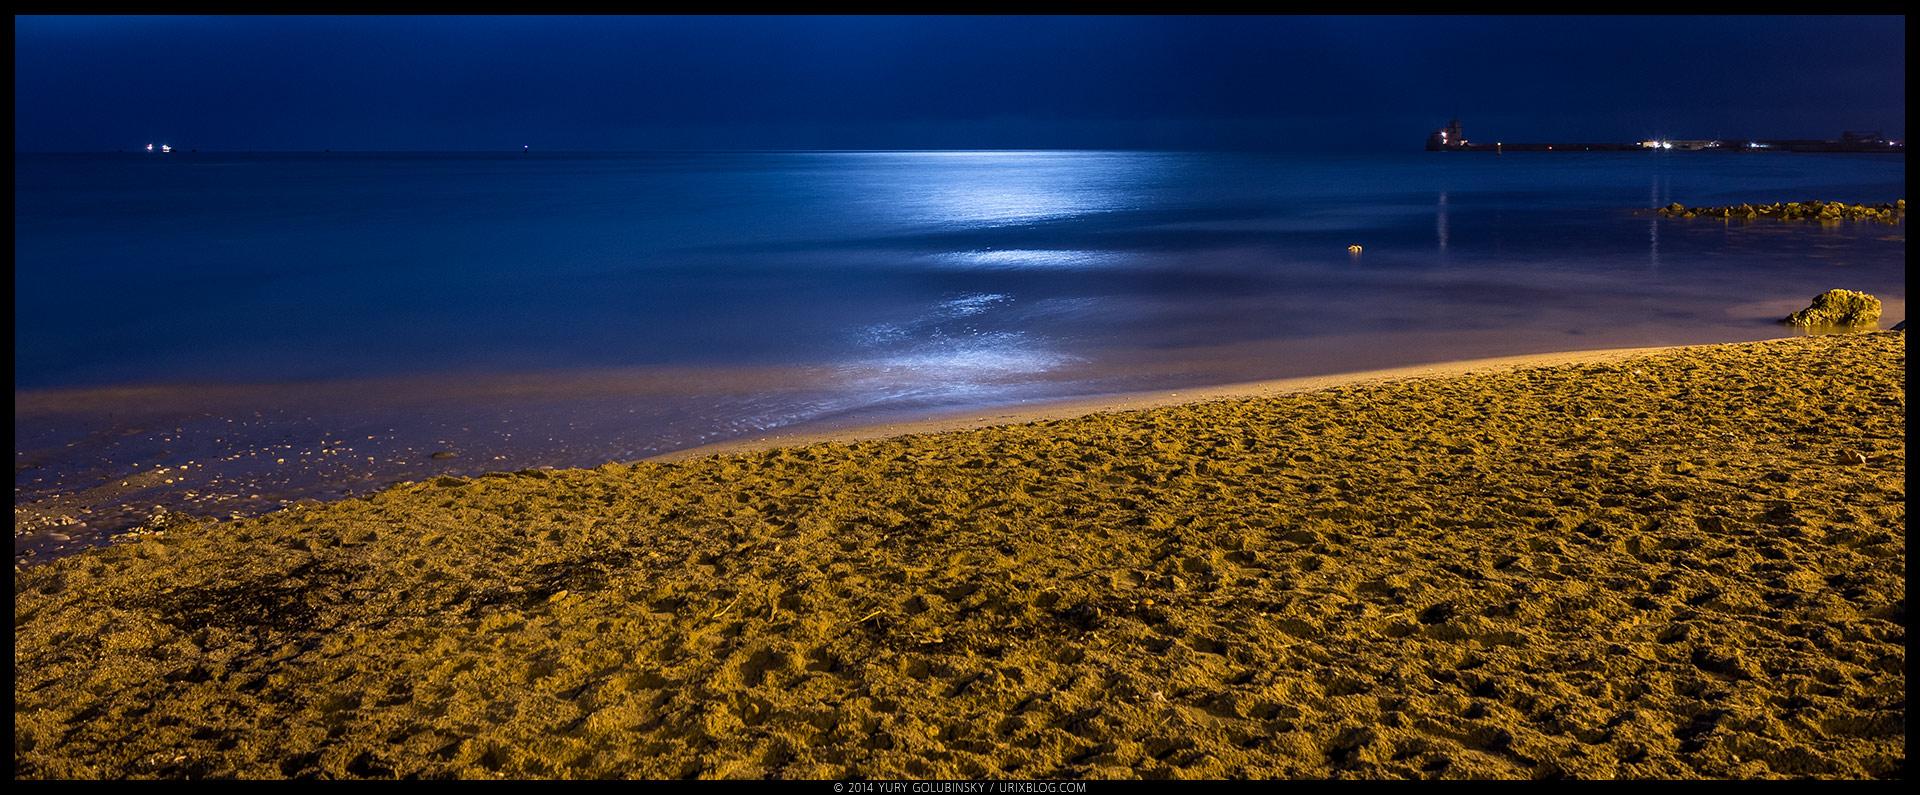 night, beach, sand, Black sea, moon, reflection, Feodosia, Crimea, Russia, winter, january, panorama, 2015